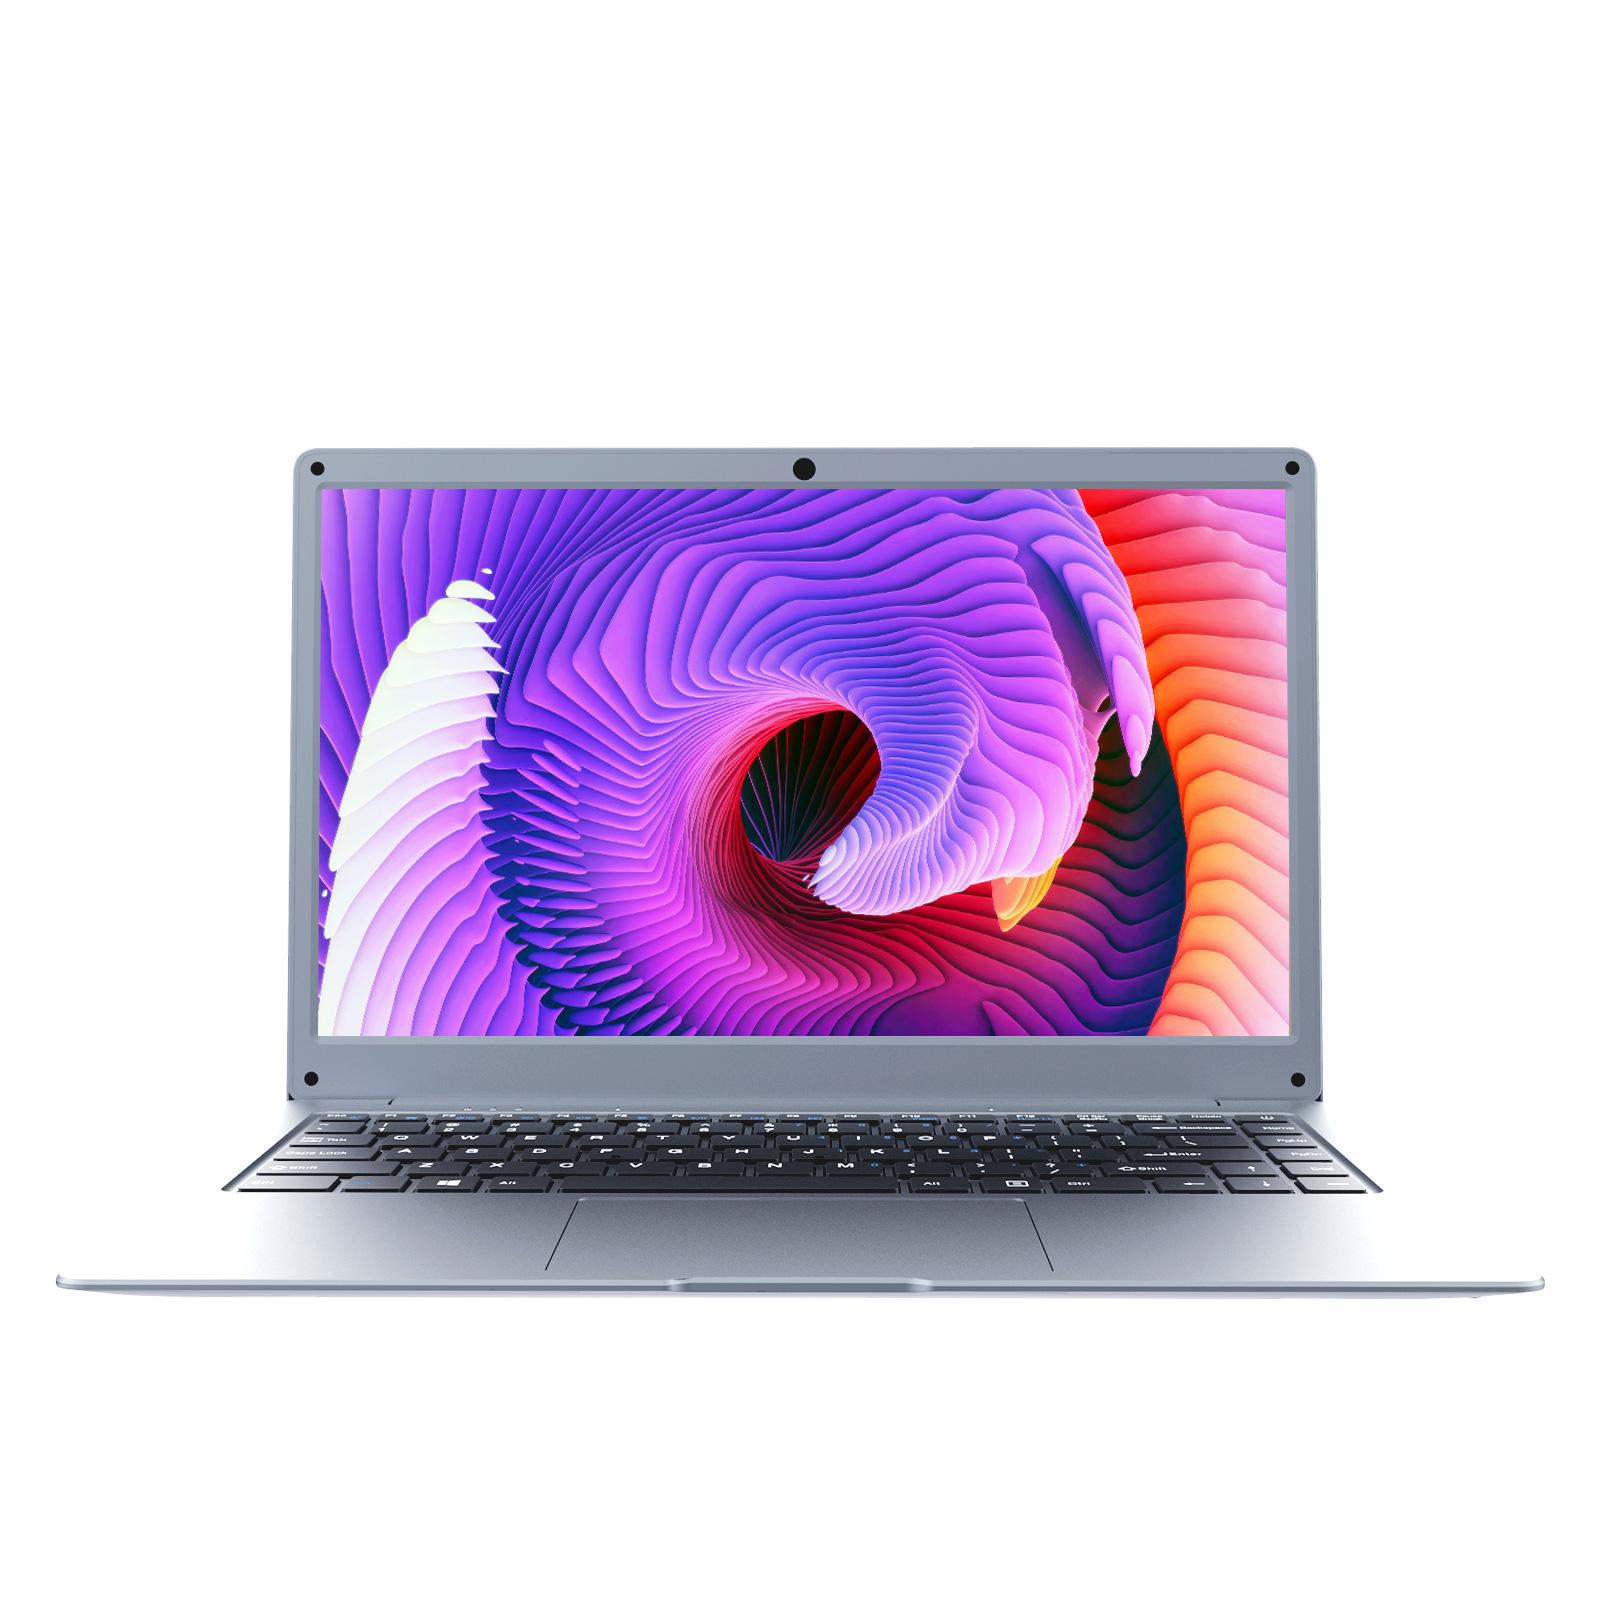 Original JUMPER Ezbook S5 Intel 14inch Laptop 4gb Ram 64gb Ssd 1920*1080 Fhd Ips Super Light 4600mah Windows 10 Notebook Laptop 4+64